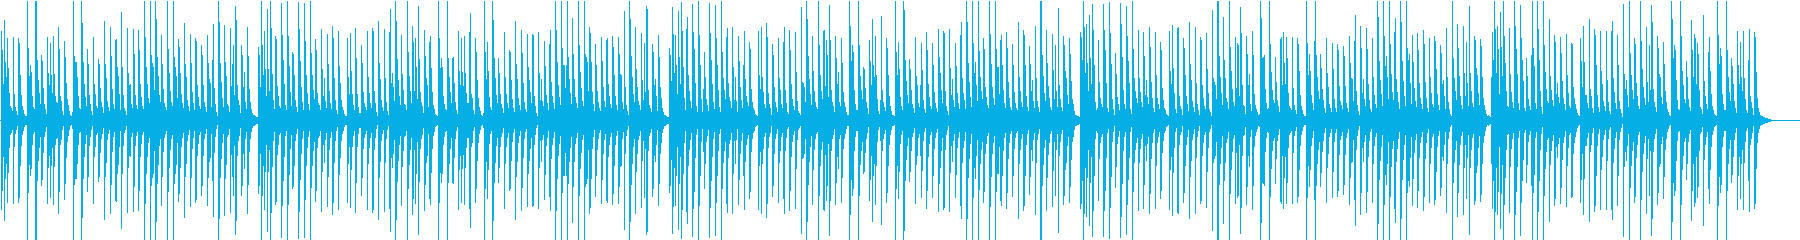 "Okinawa folk song ""Jyukunoharu"" Sanshin only's reproduced waveform"